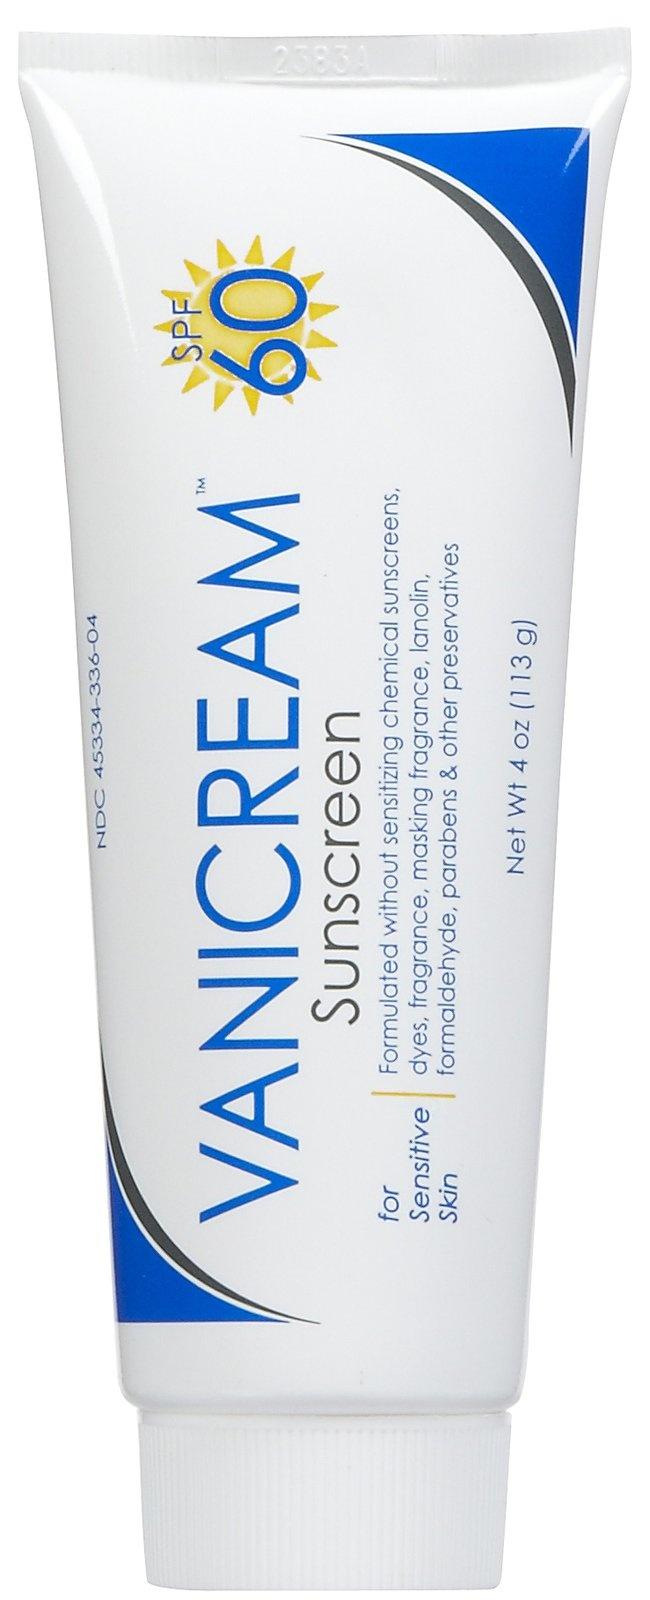 Vanicream Sunscreen SPF 60 4 oz Best Price. doc said